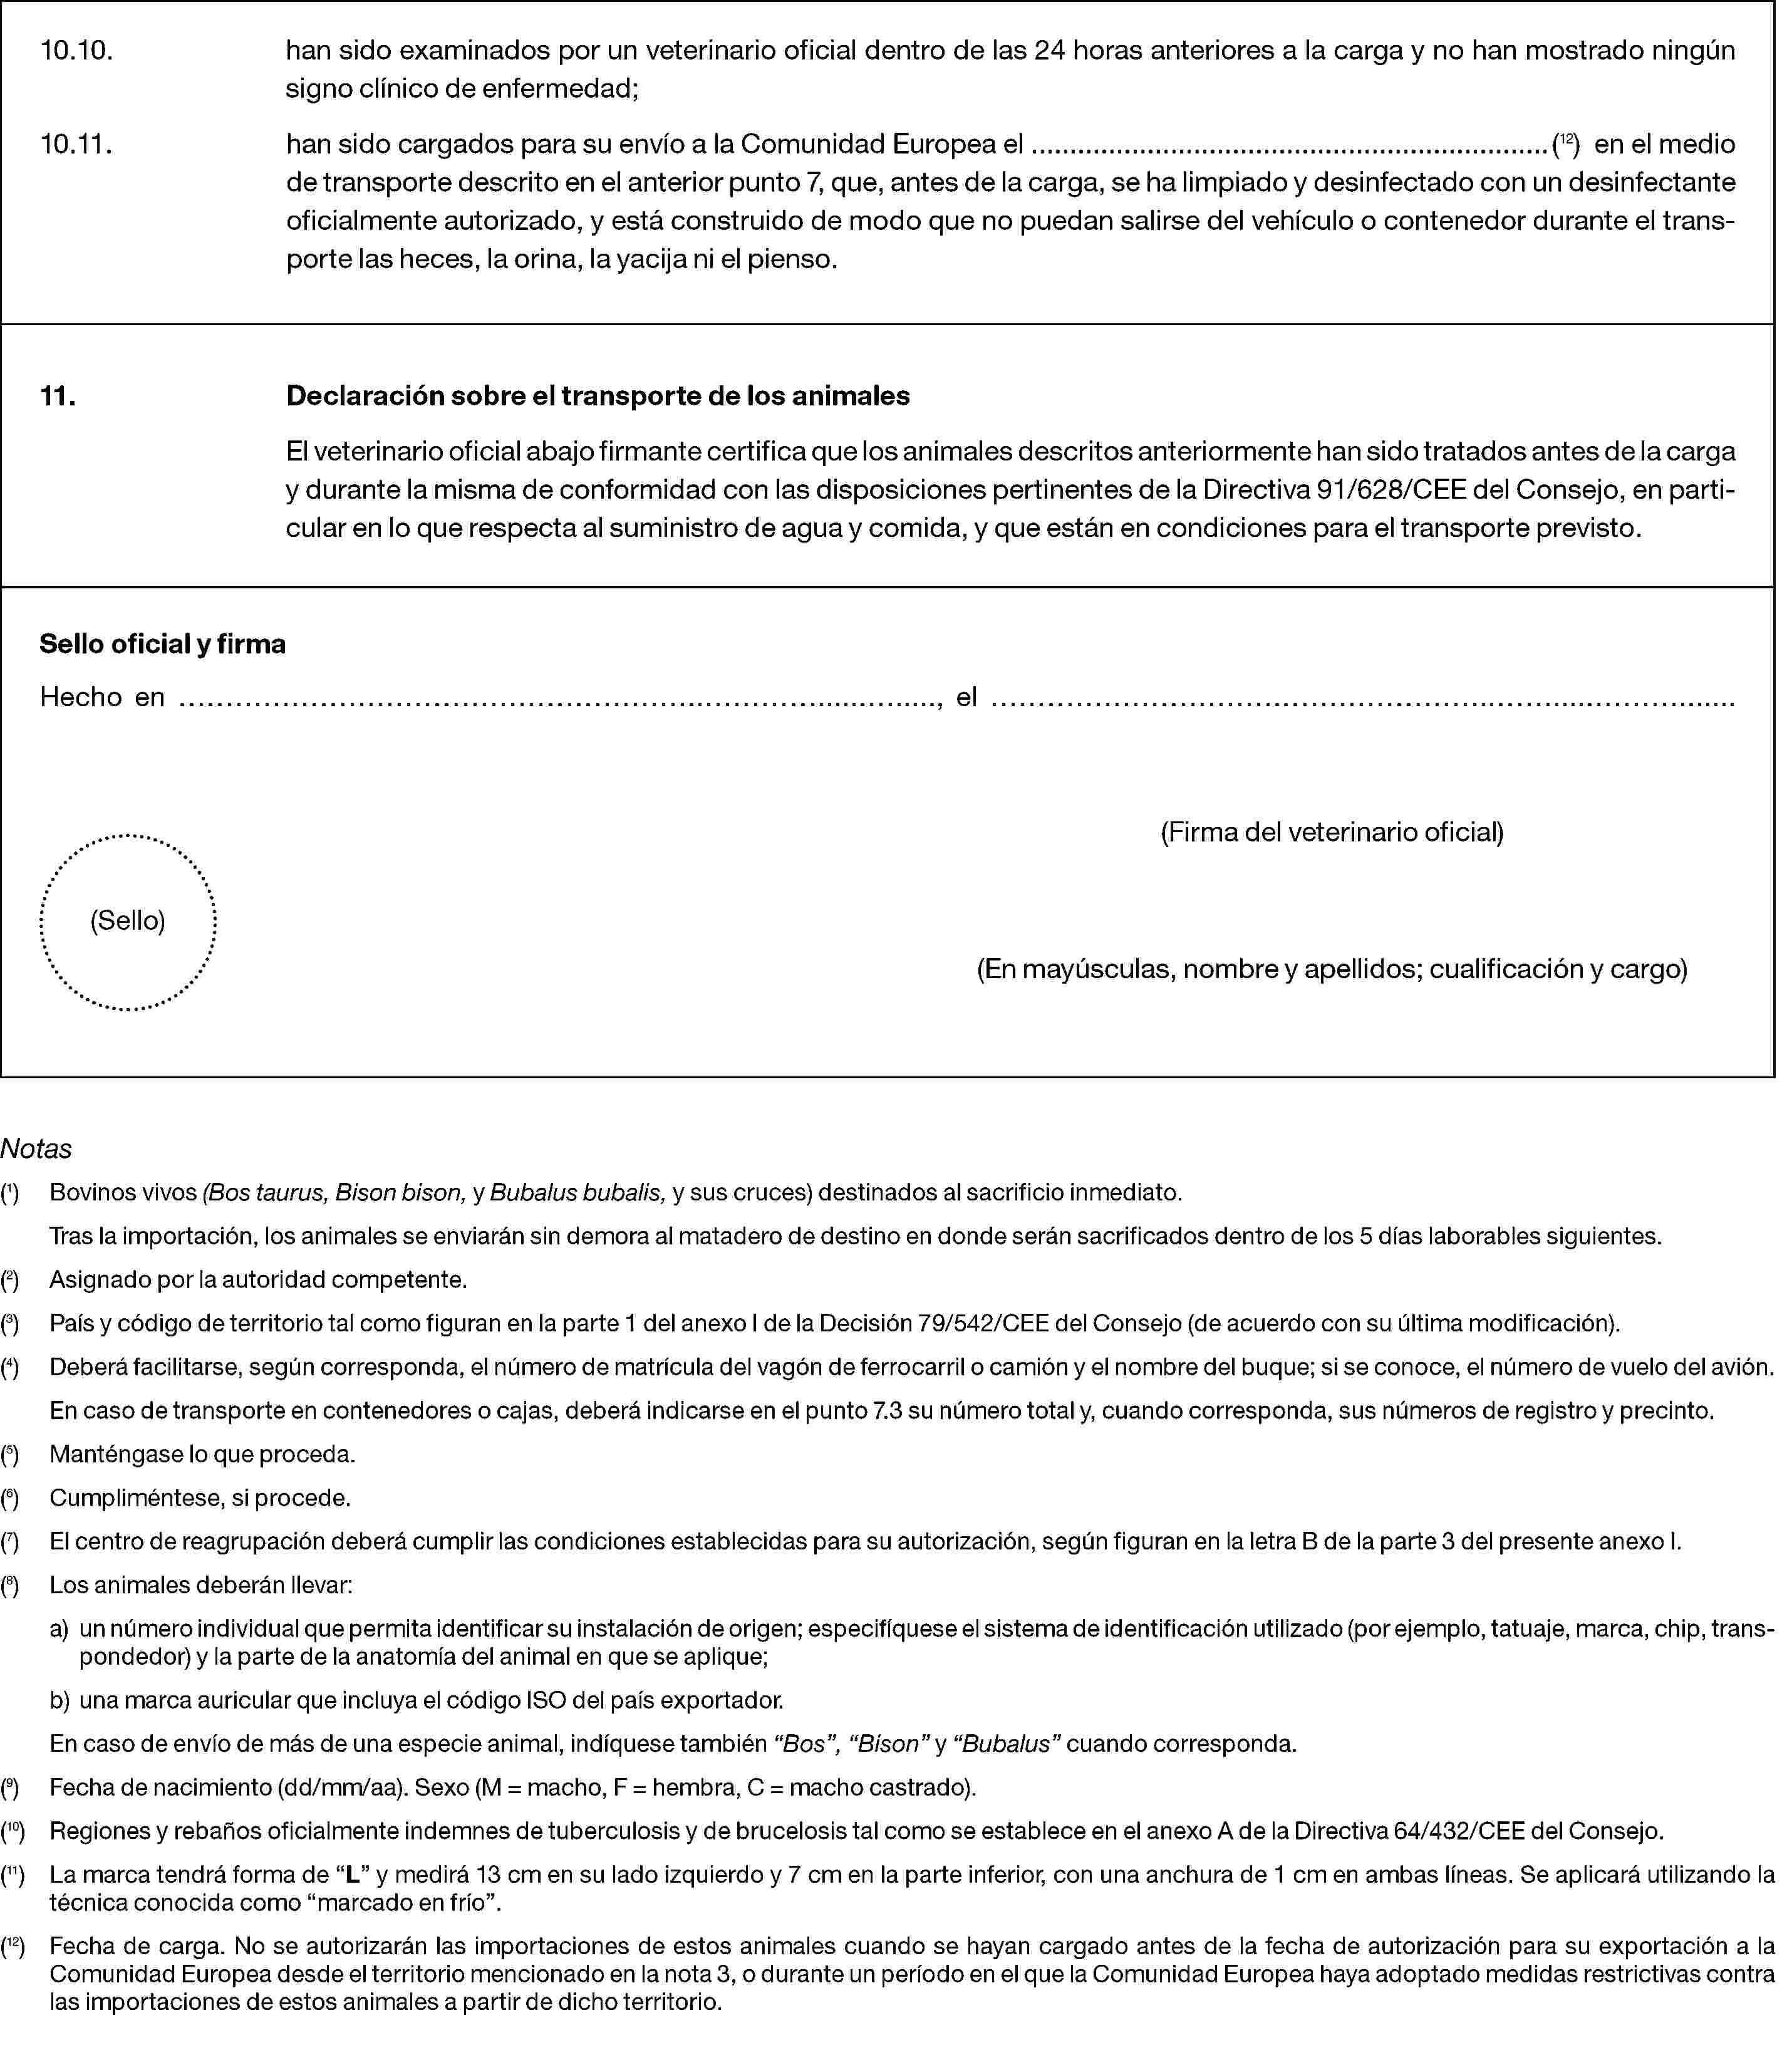 Asombroso Certificado De Nacimiento Adoptada Viñeta - Cómo conseguir ...